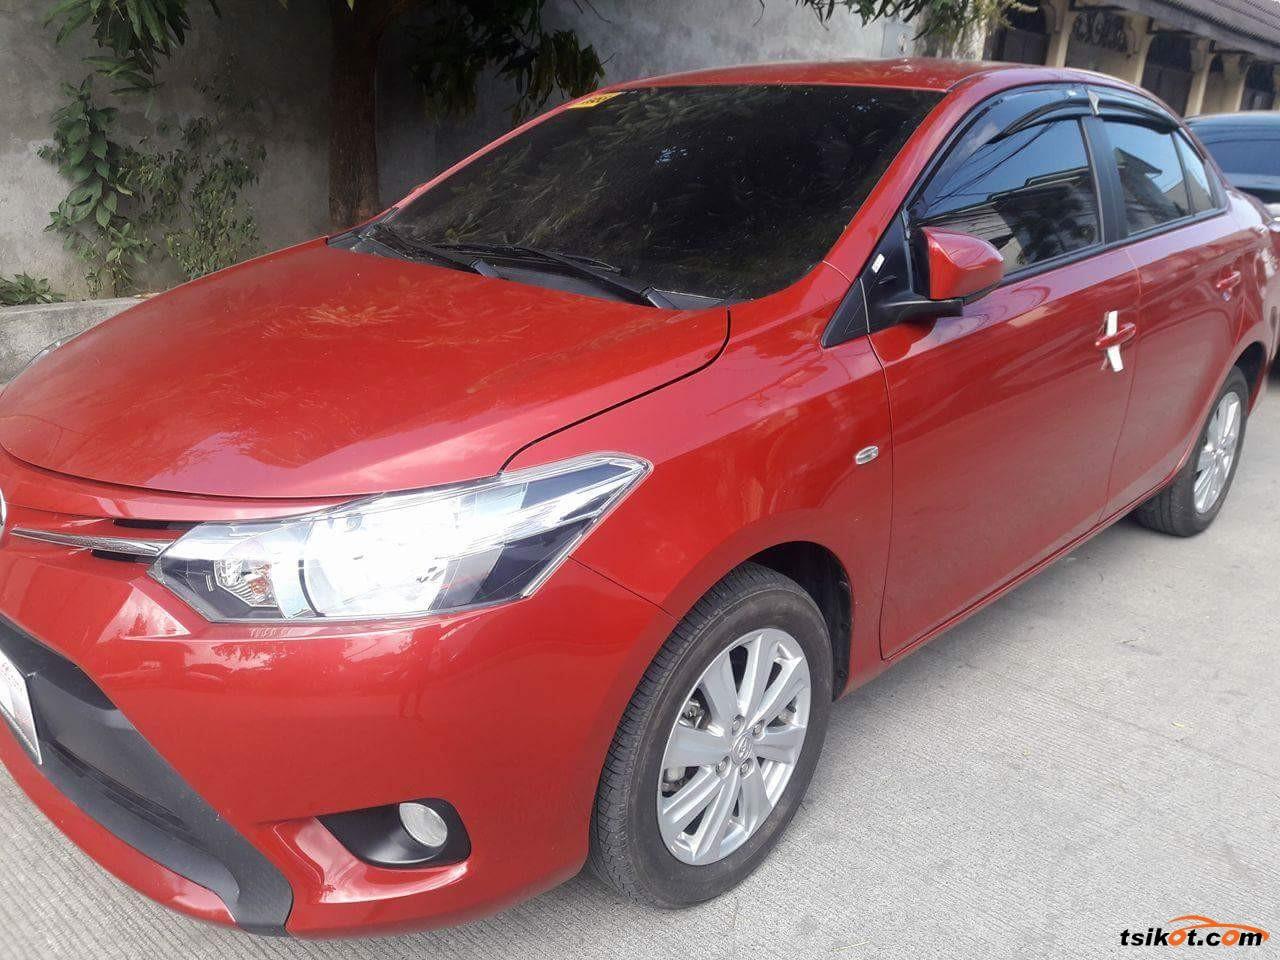 Kelebihan Toyota Vios 2015 Harga